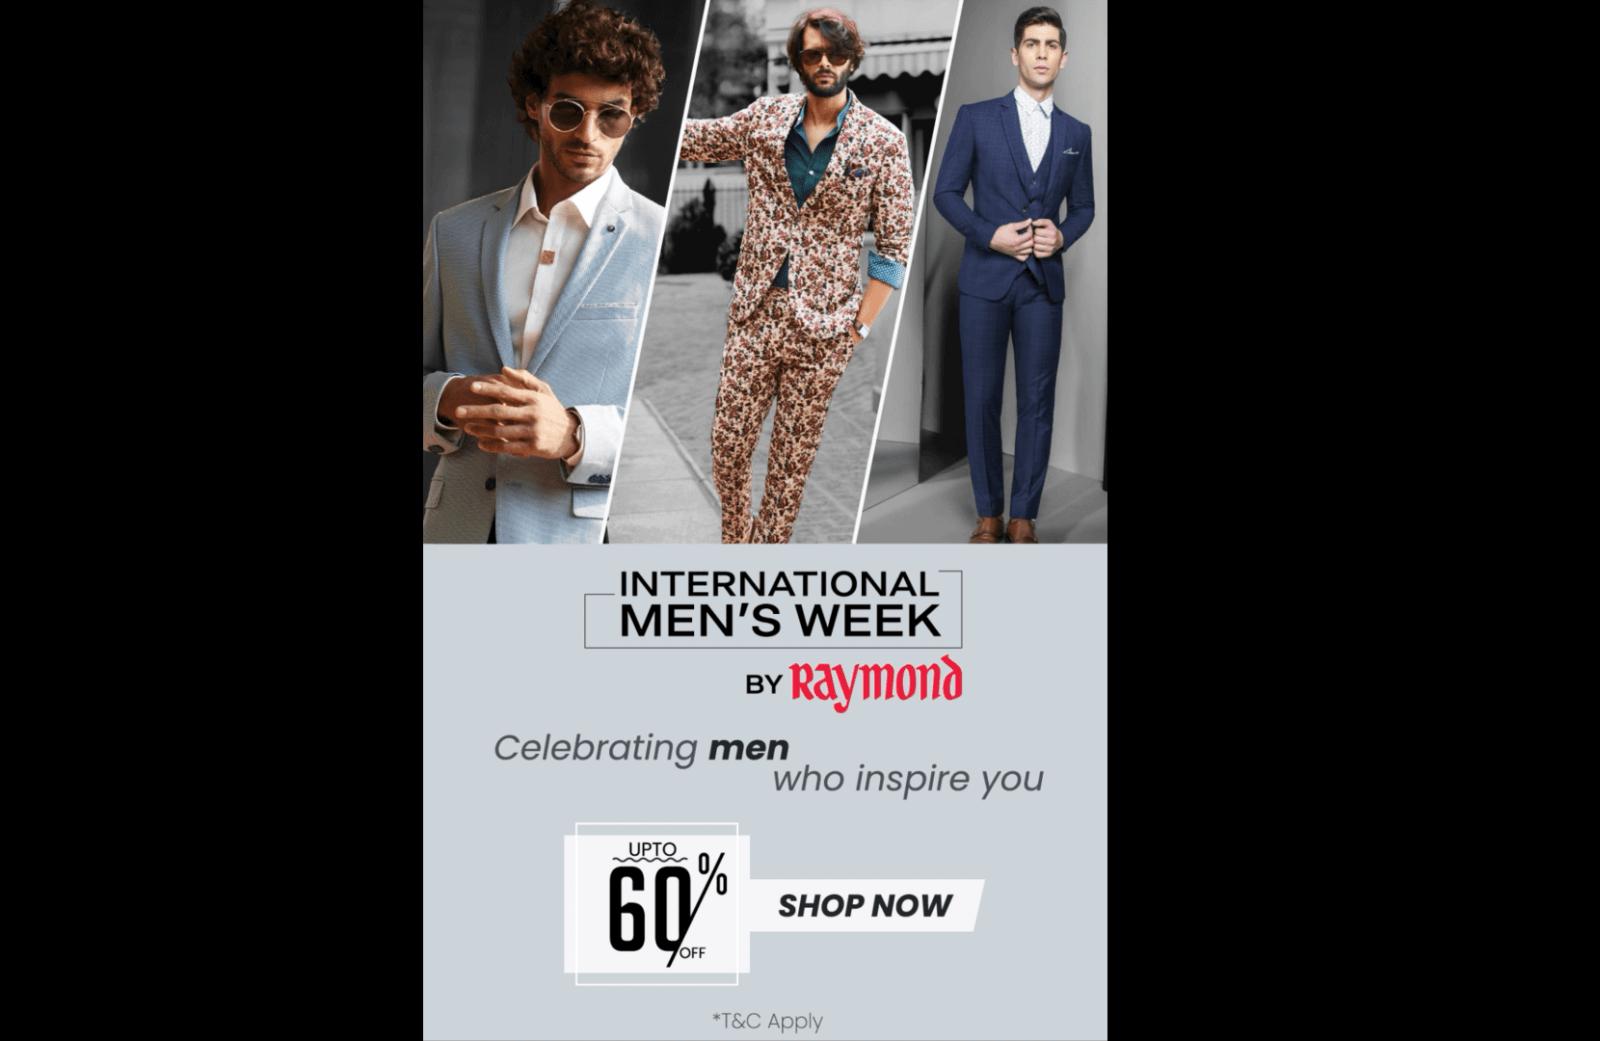 Raymond Video - Mens' Week Sale